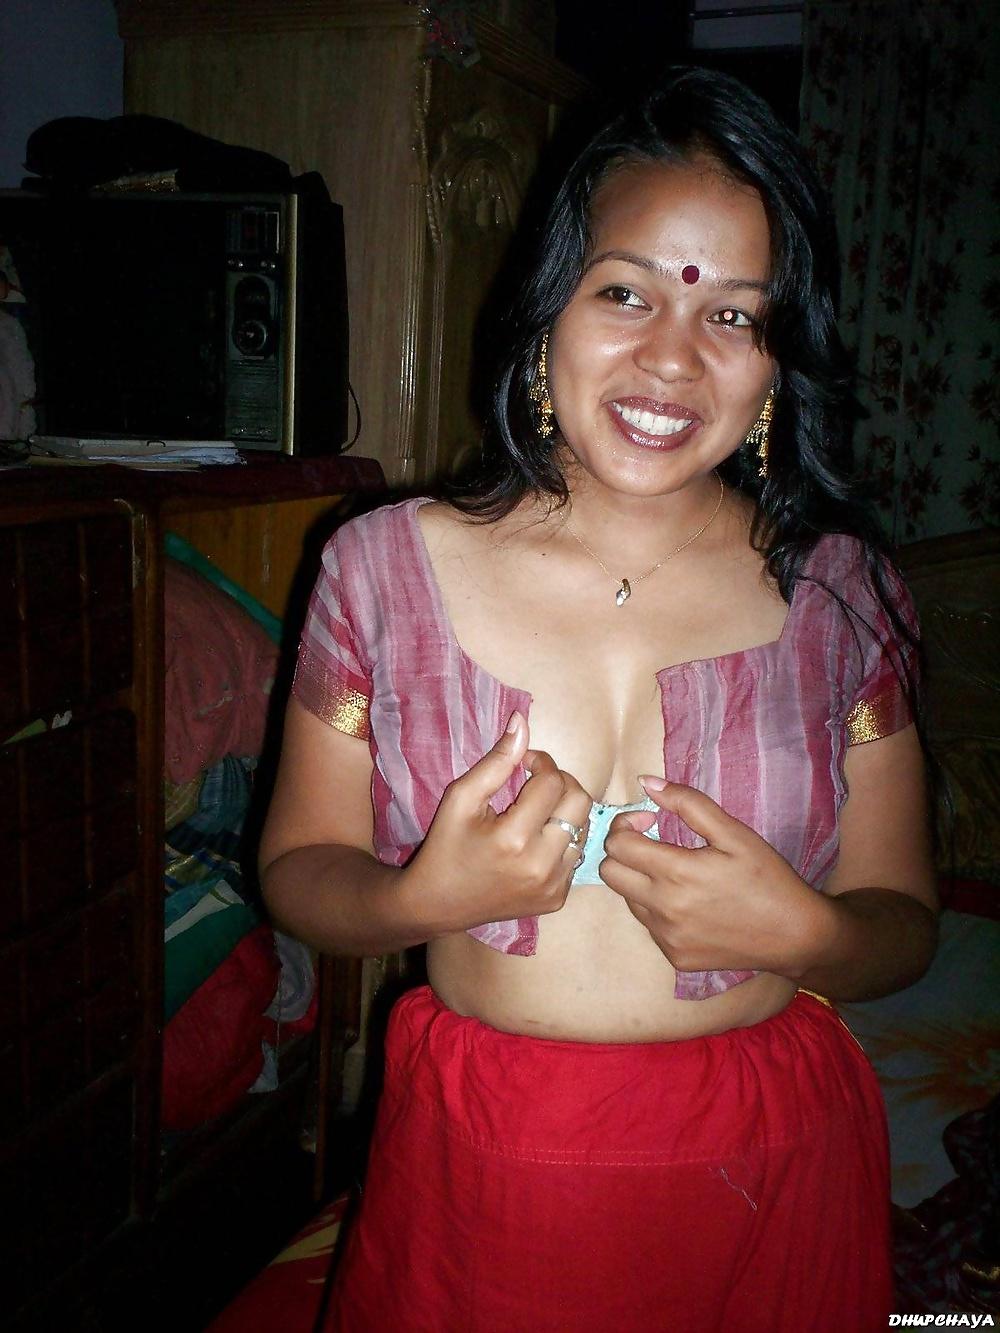 bangali-girl-neked-hot-photo-extremely-hot-girls-with-tattoos-on-beach-nude